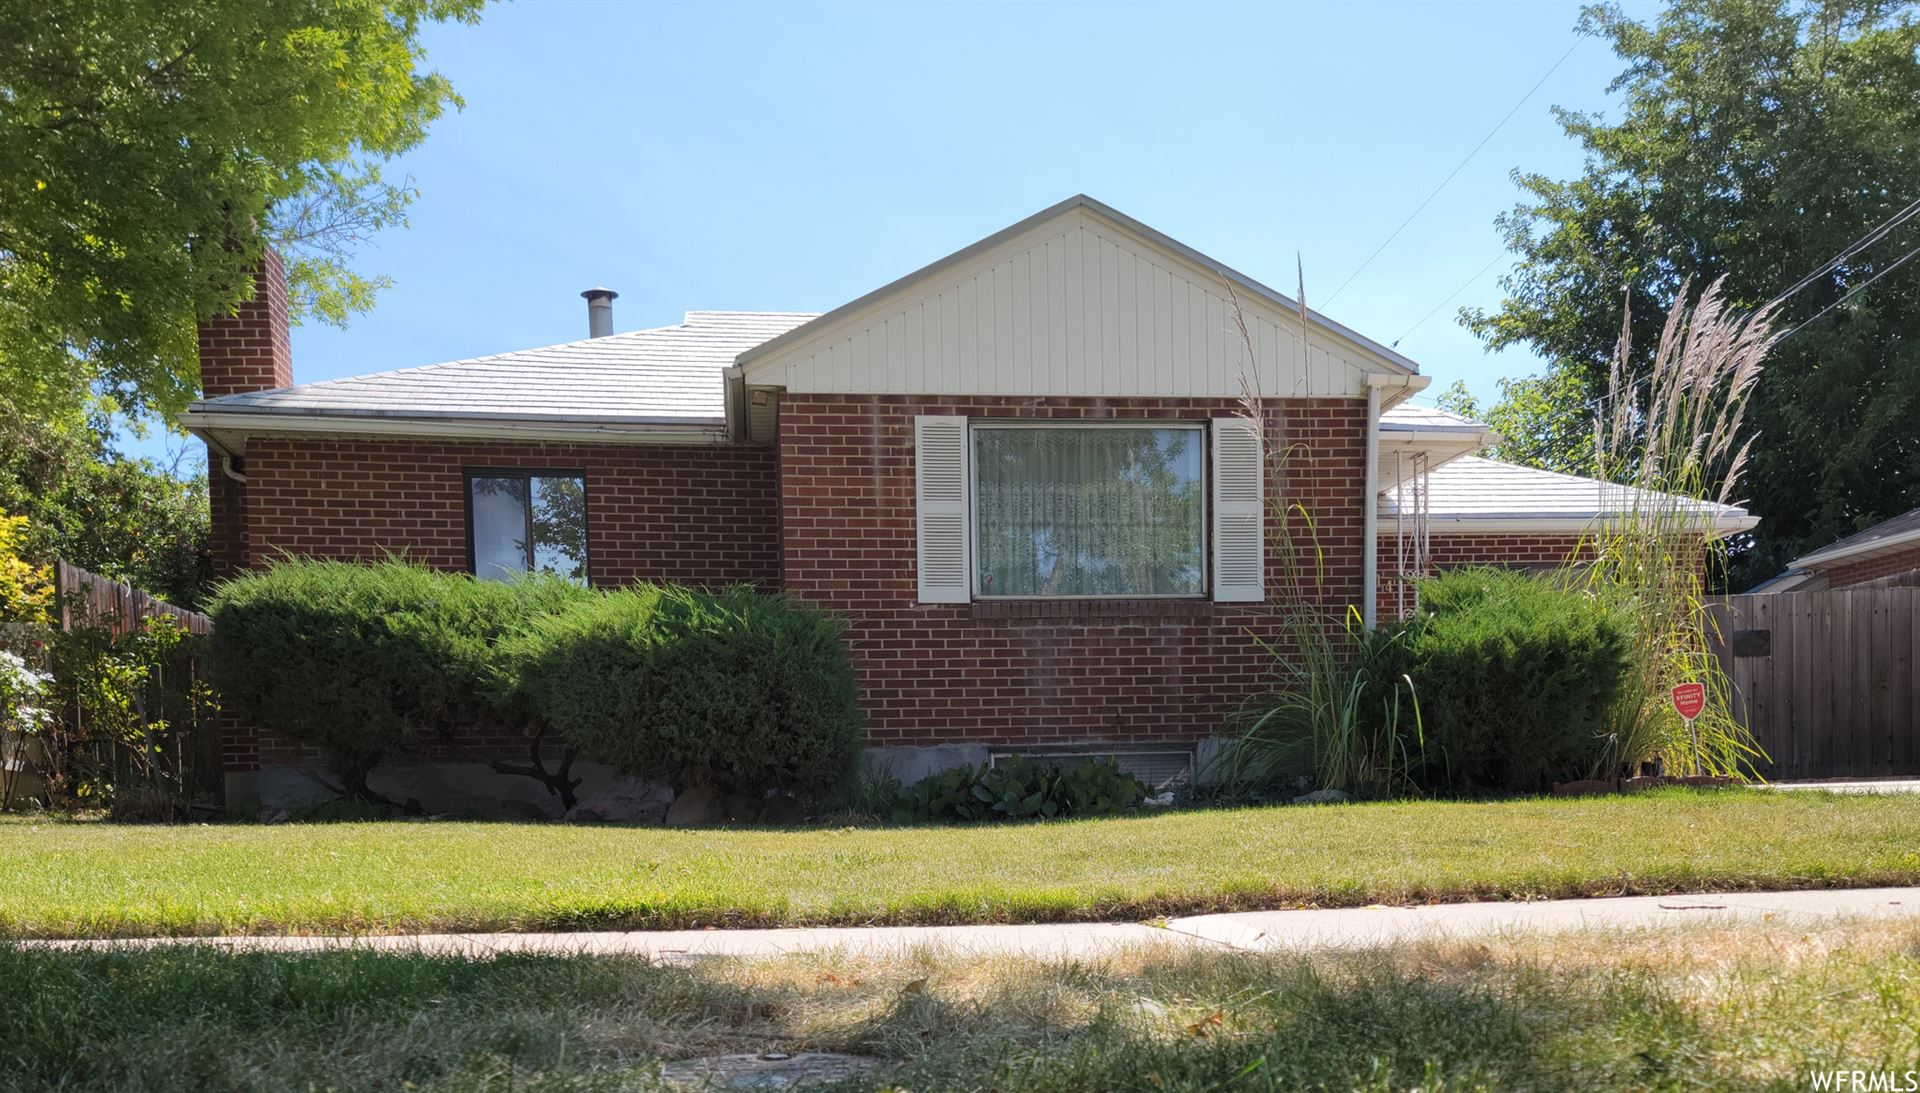 Photo of 1141 N SAN FERNANDO W DR, Salt Lake City, UT 84116 (MLS # 1770852)